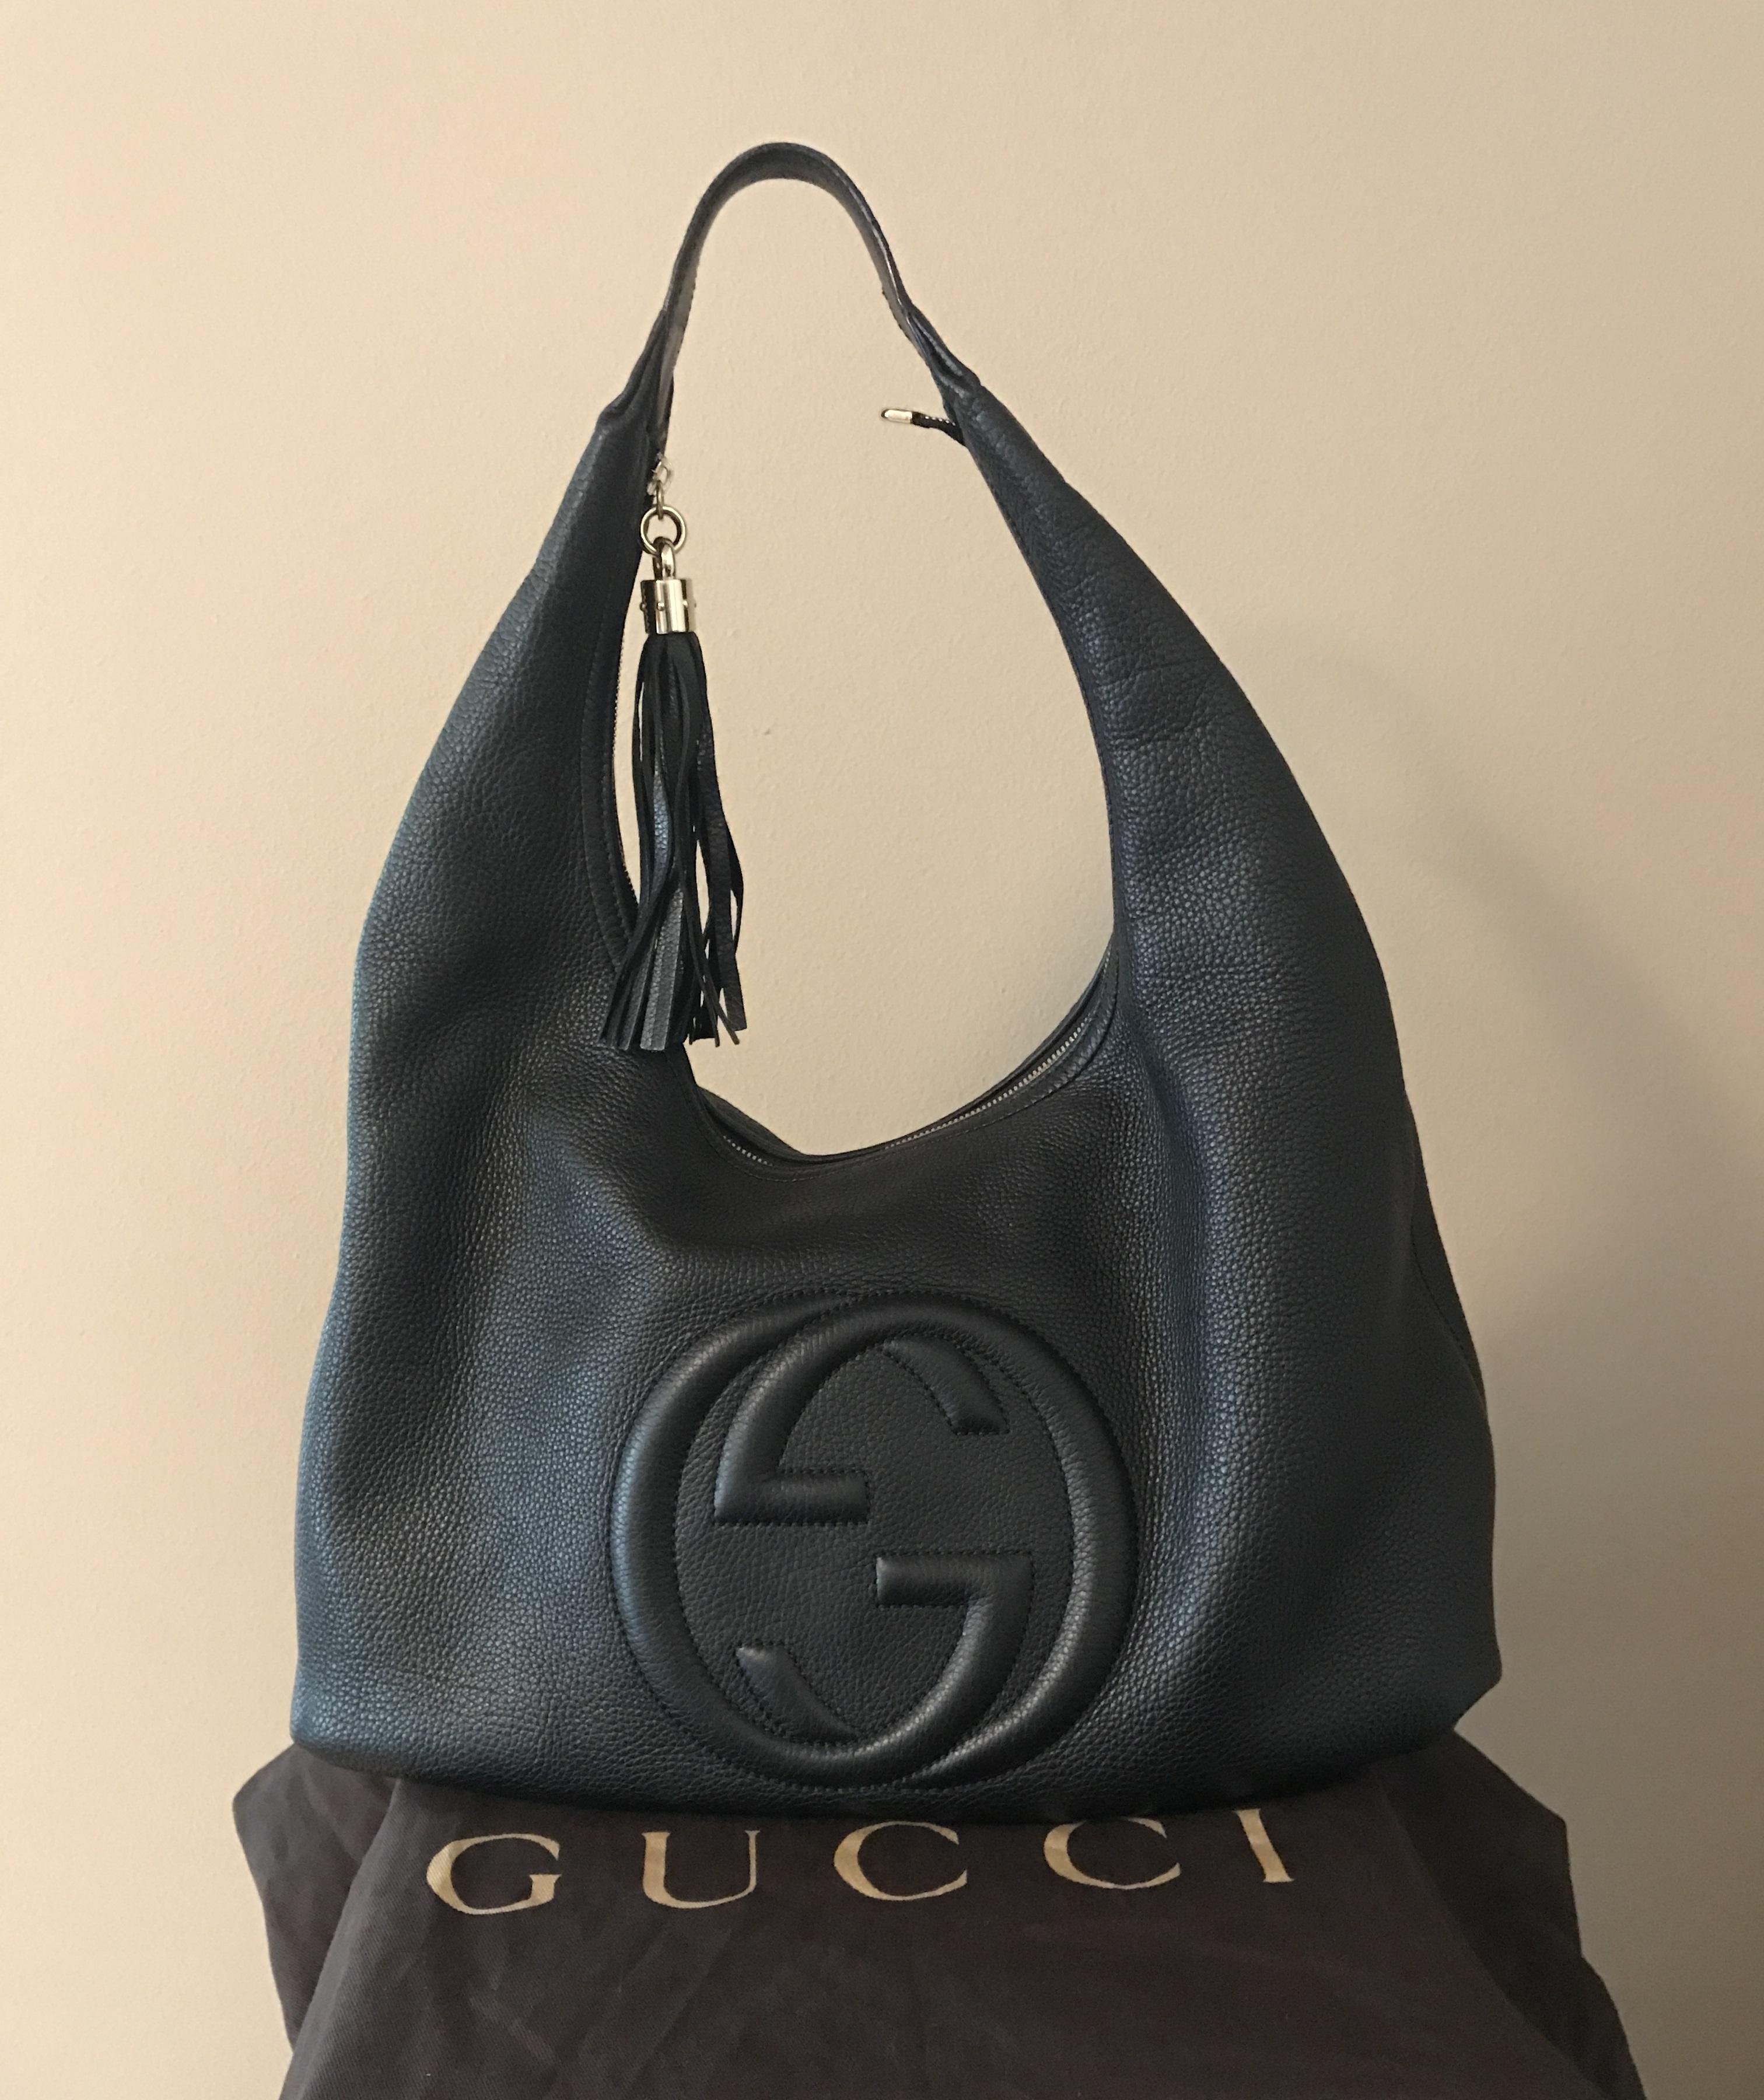 Gucci-Soho-Handbag-front